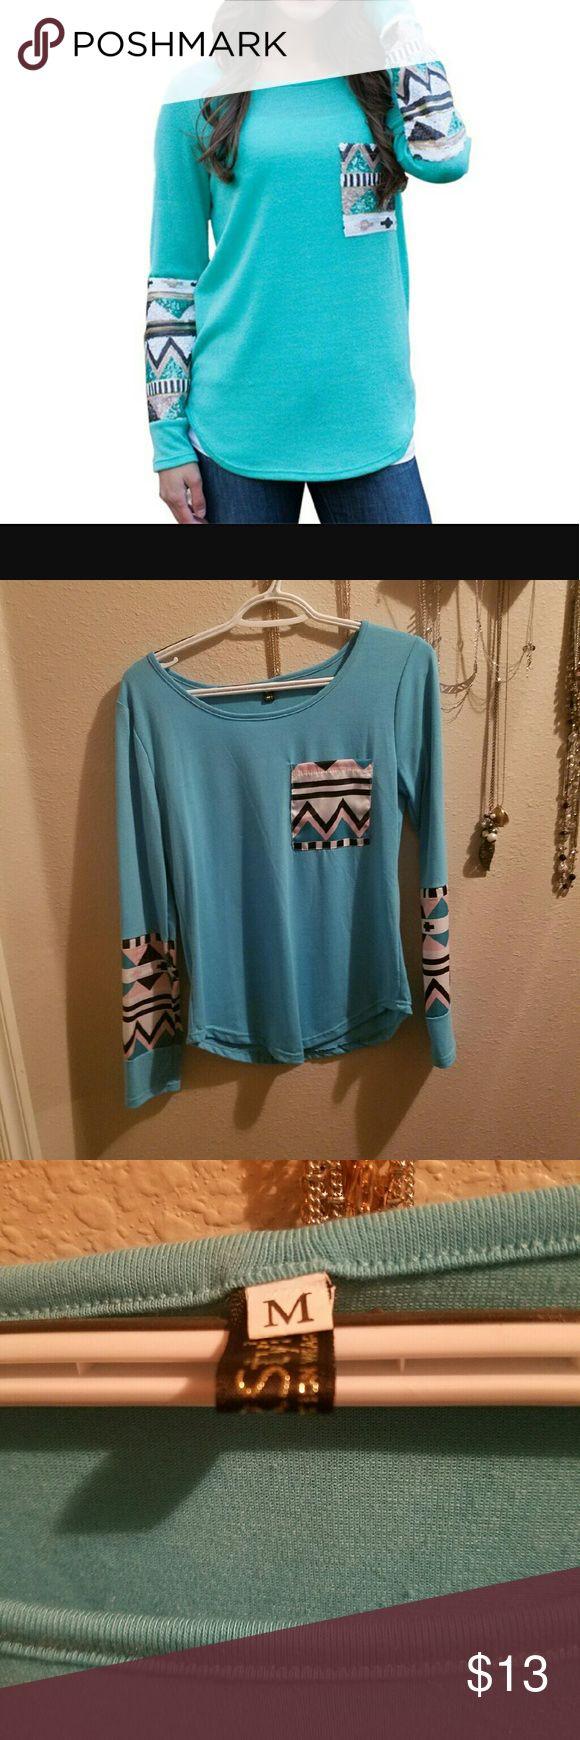 Long sleeve shirt Long sleeve aztec shirt. Cute shirt. Tops Tees - Long Sleeve